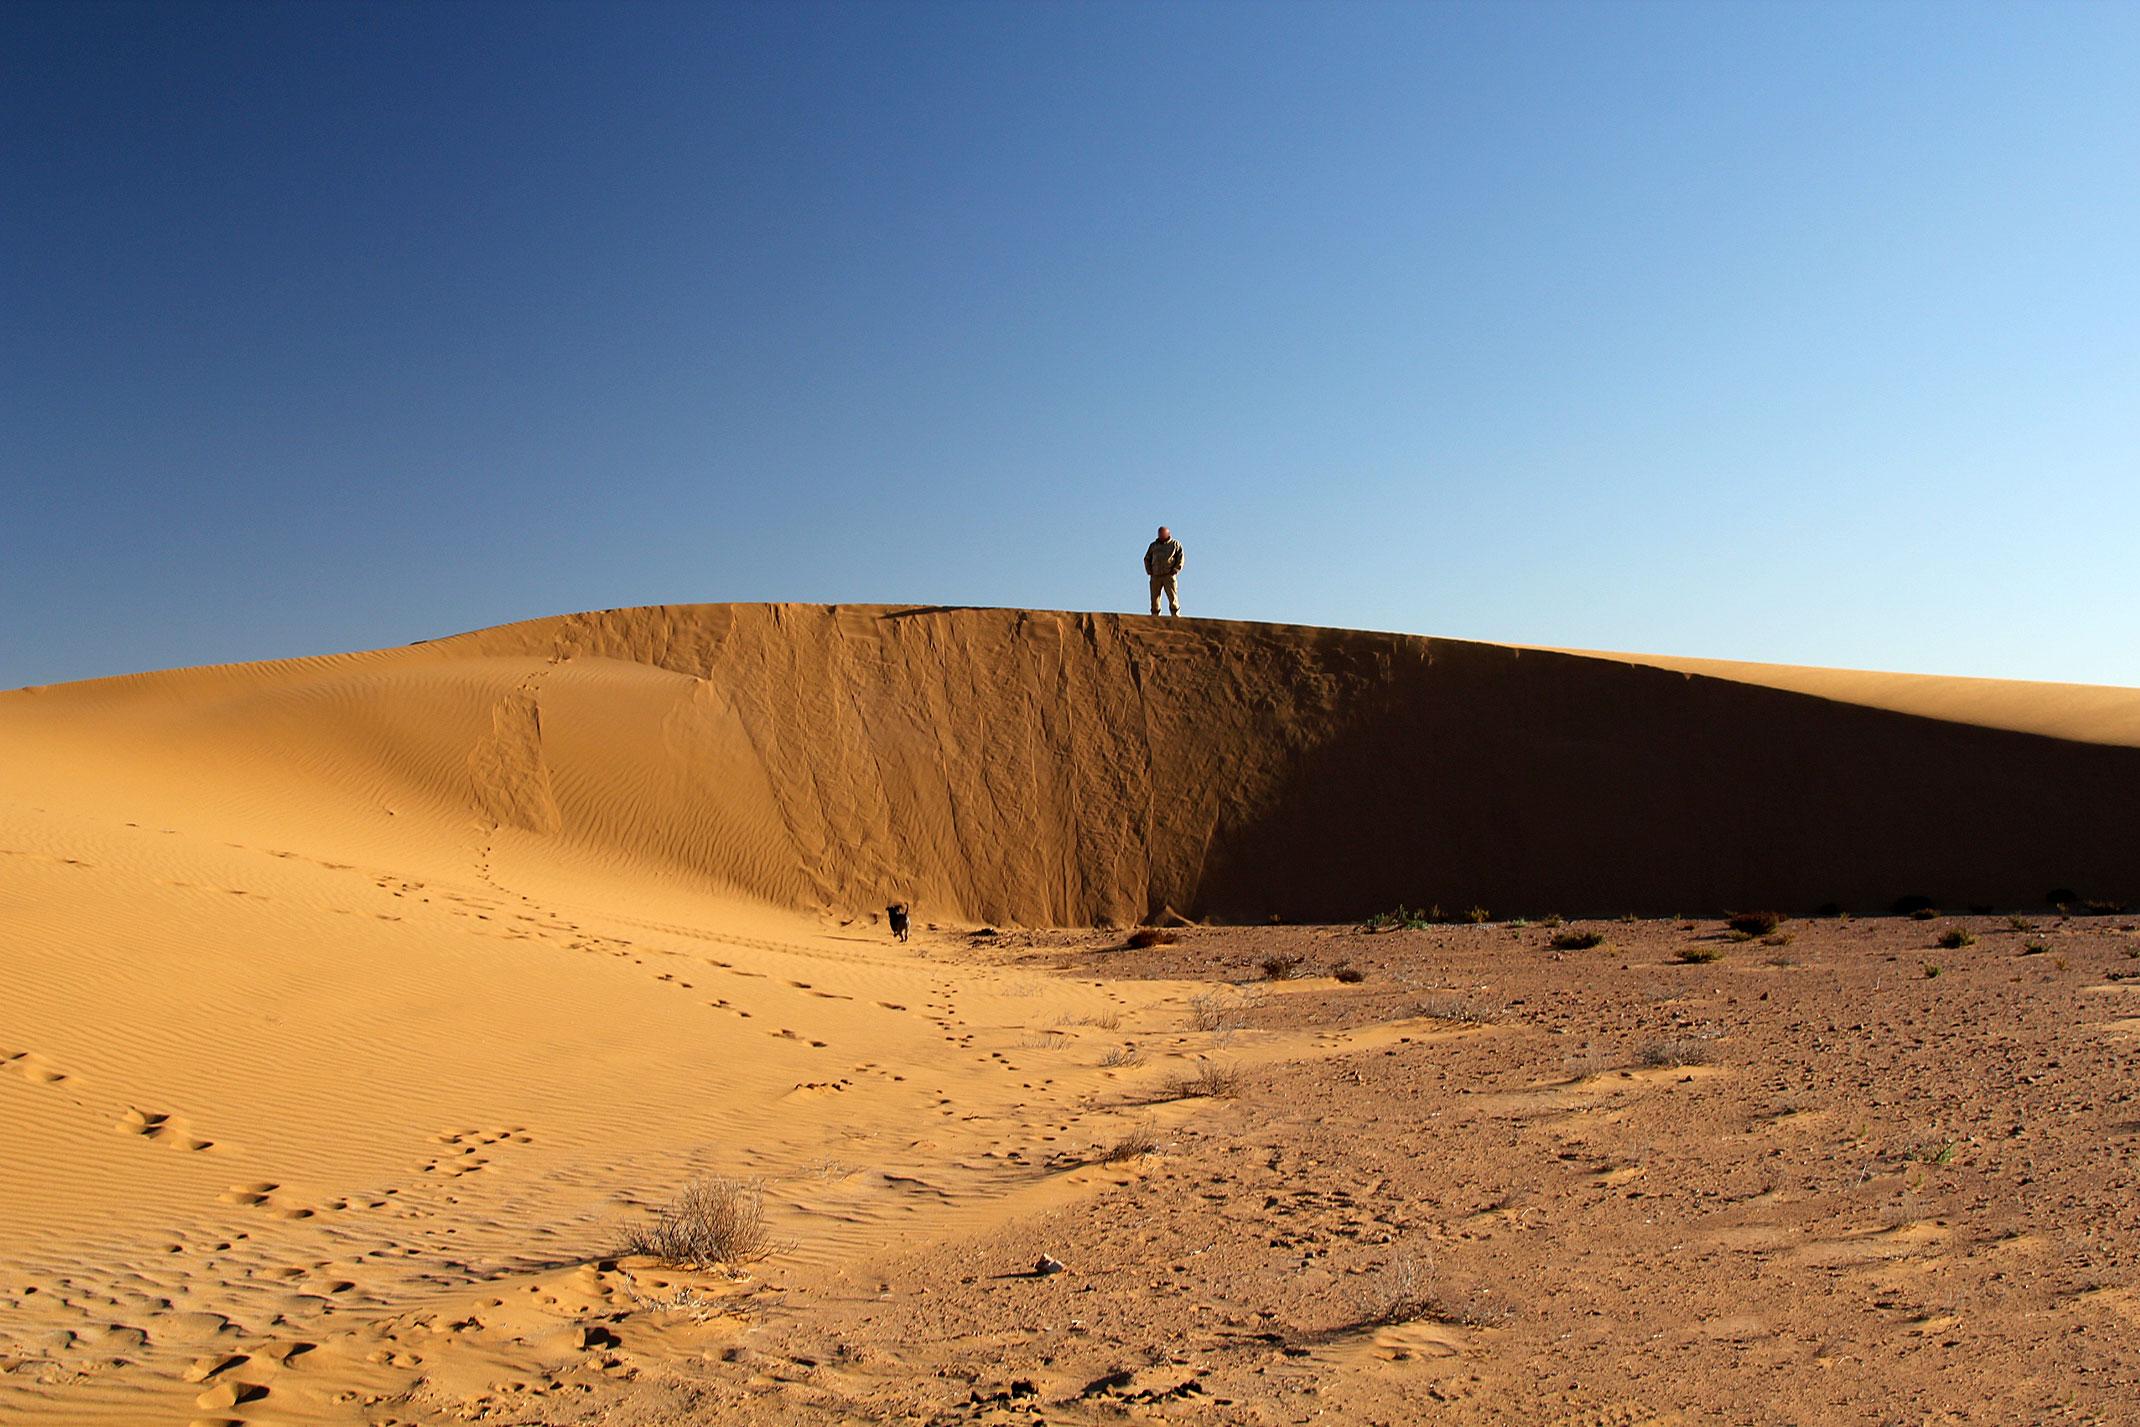 Sahara Zachodnia.Piaski pustyni.